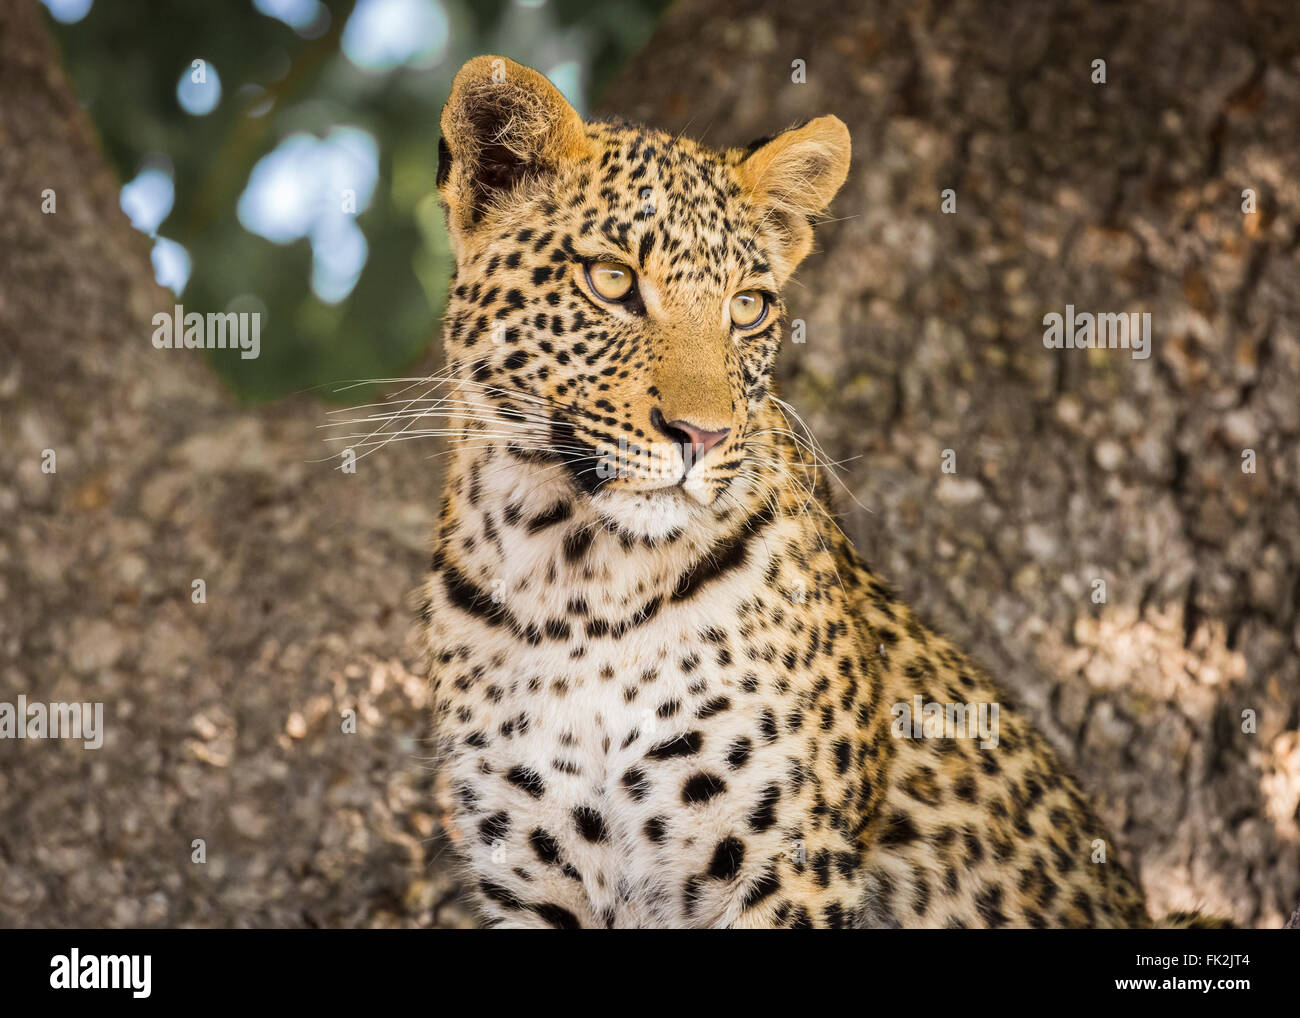 Close up of head of leopard (Panthera pardus), Zarafa Camp, Selinda Concession, Okavango Delta, northern Botswana - Stock Image